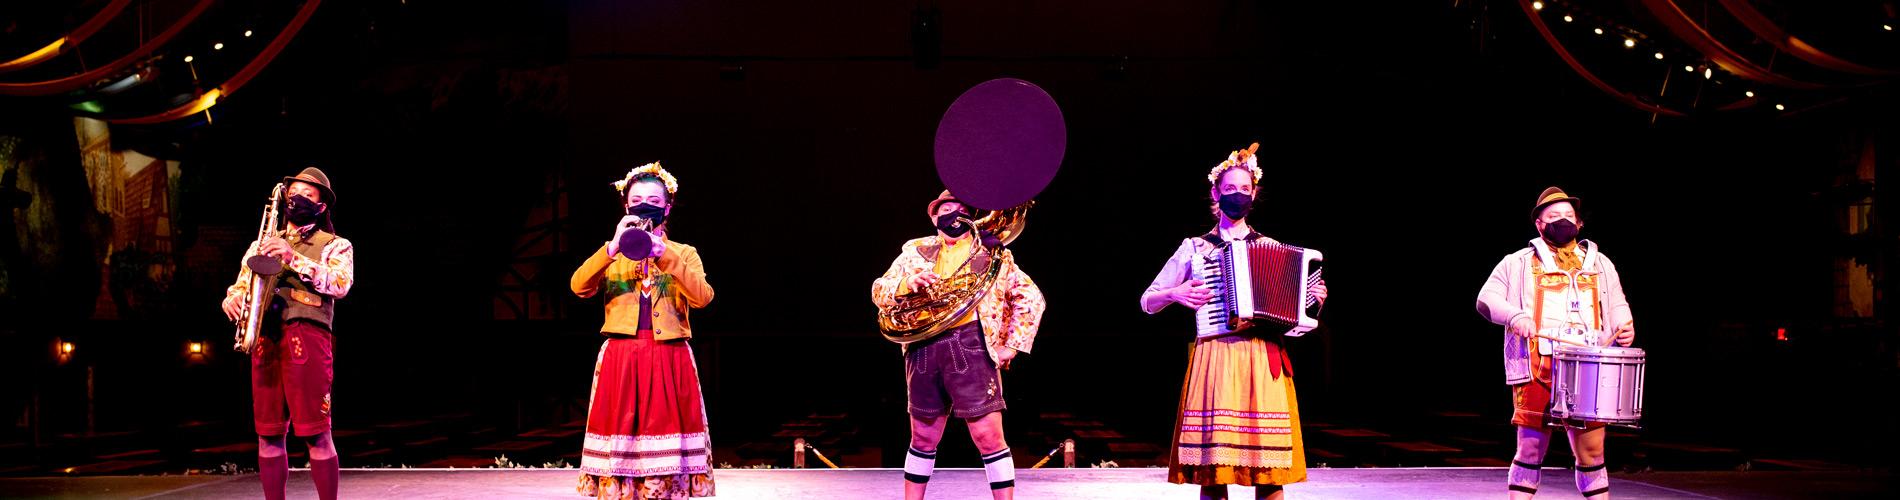 Oom-pah Band at Das Festhaus